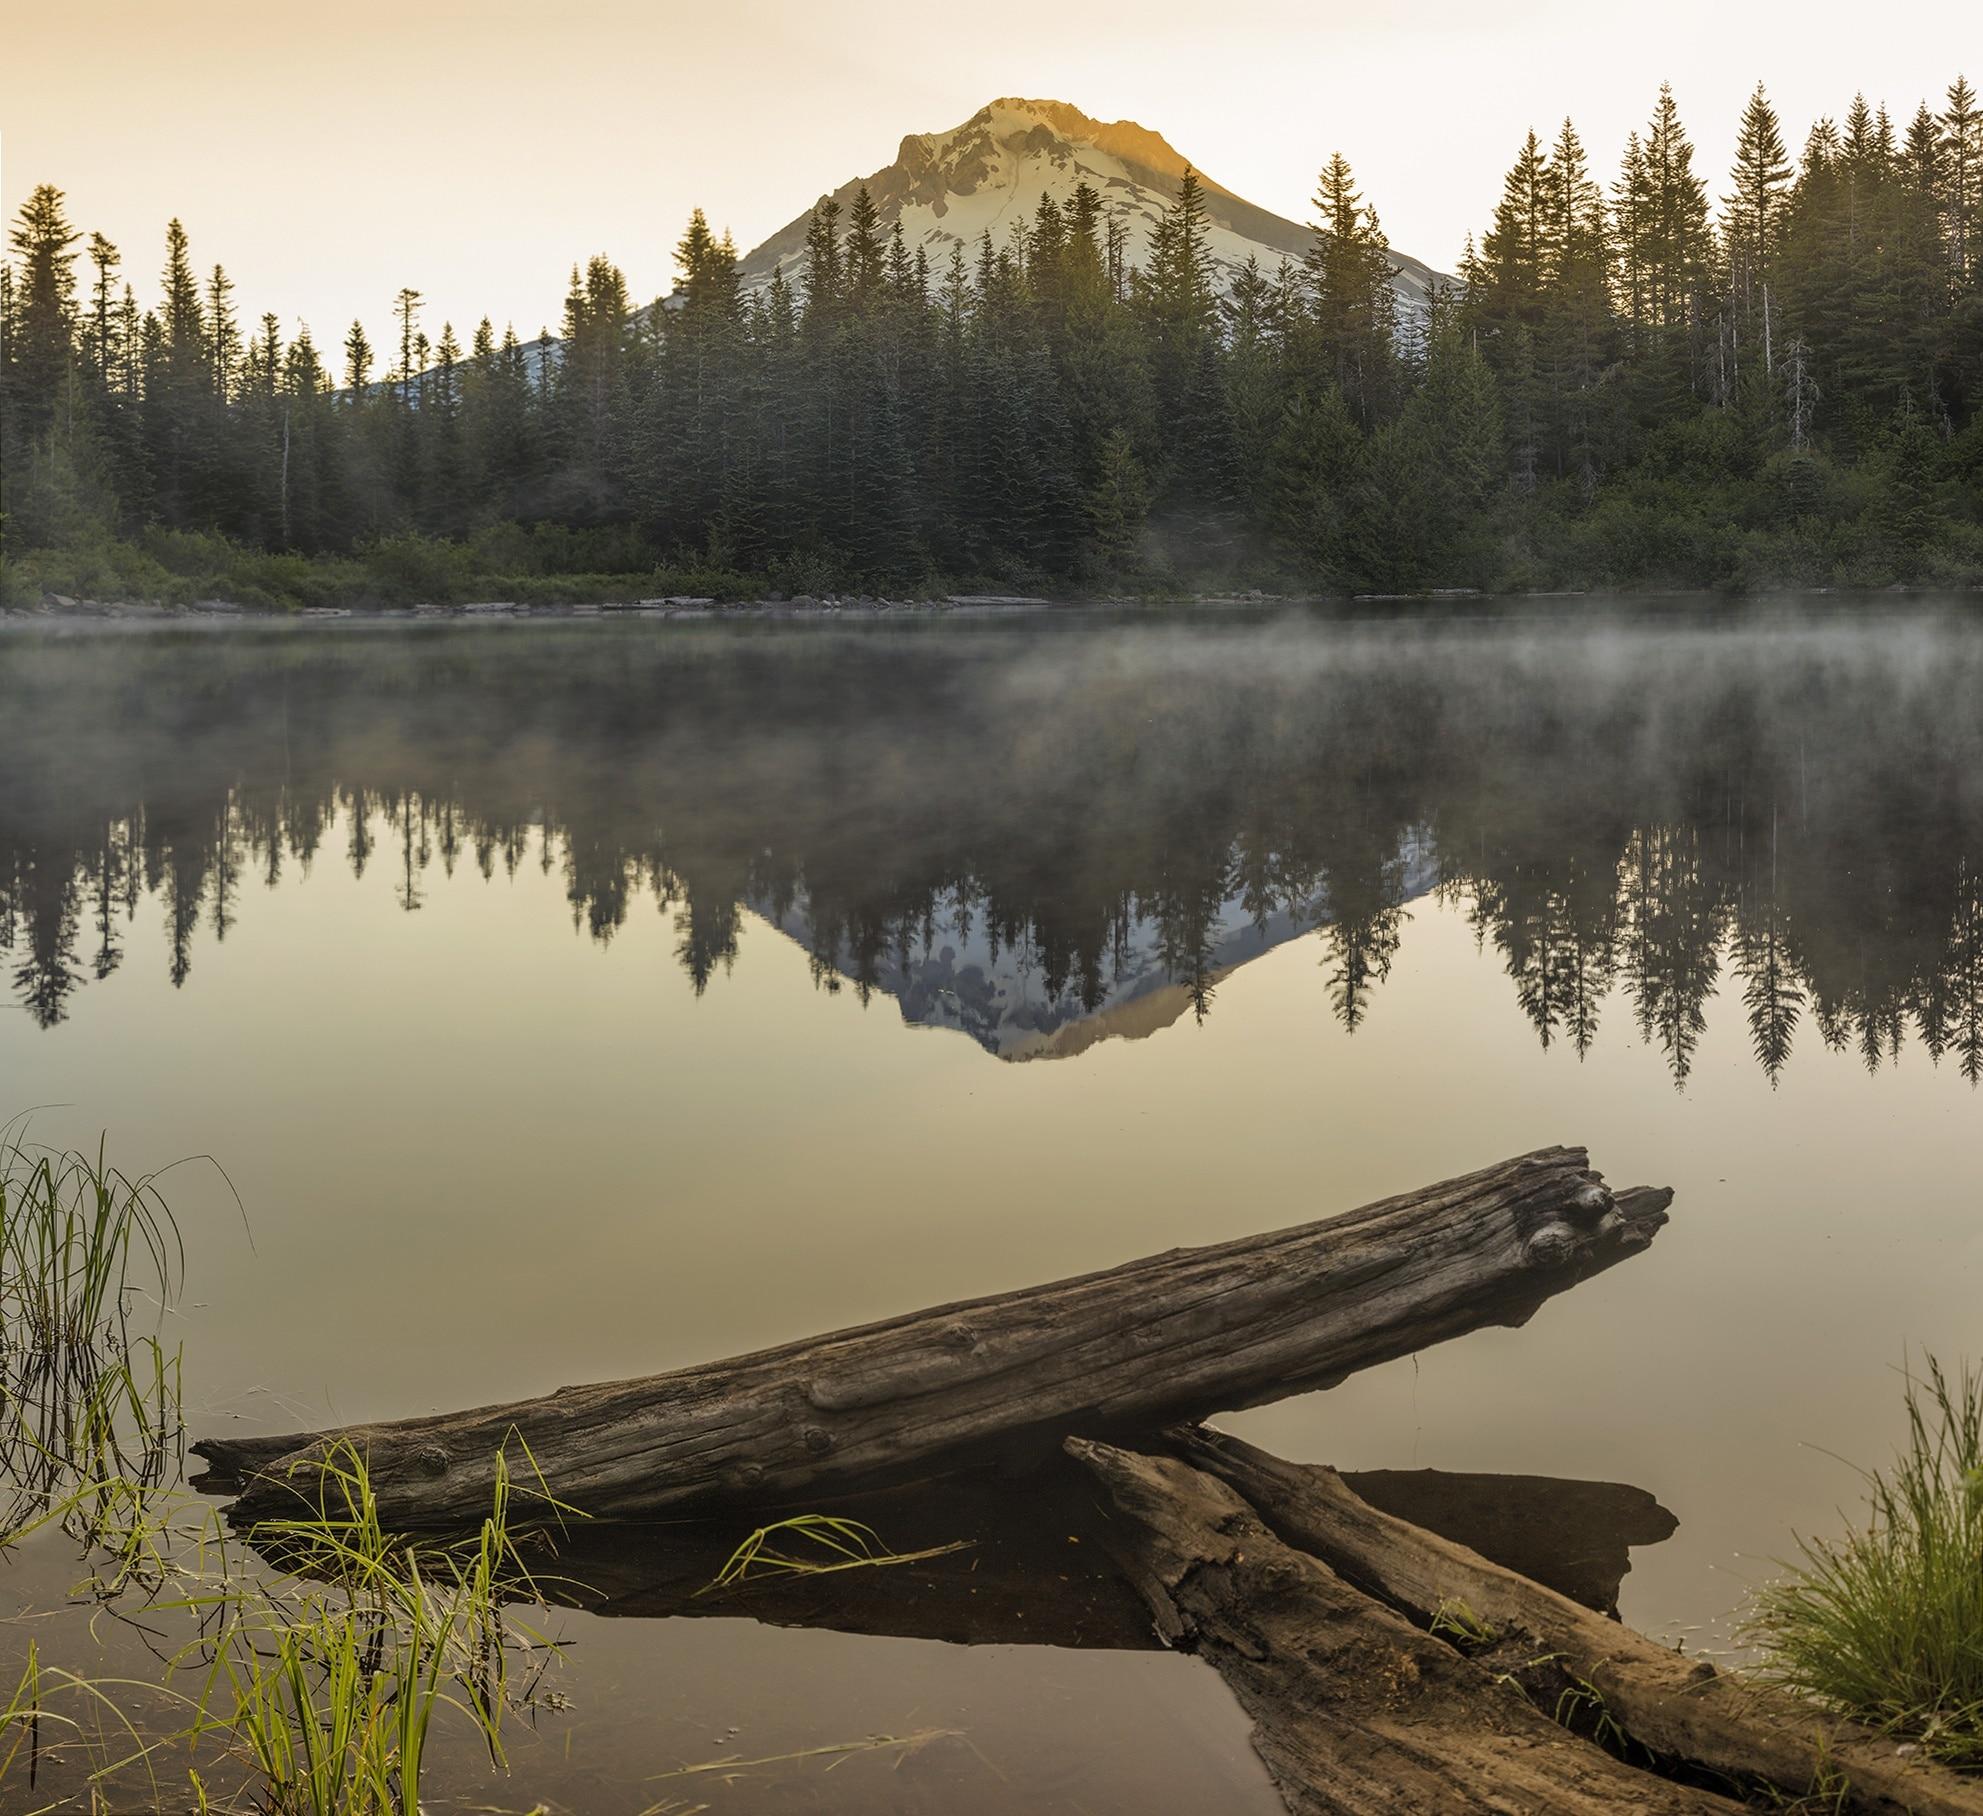 Mirror Lake Trail, Government Camp, Oregon, United States of America